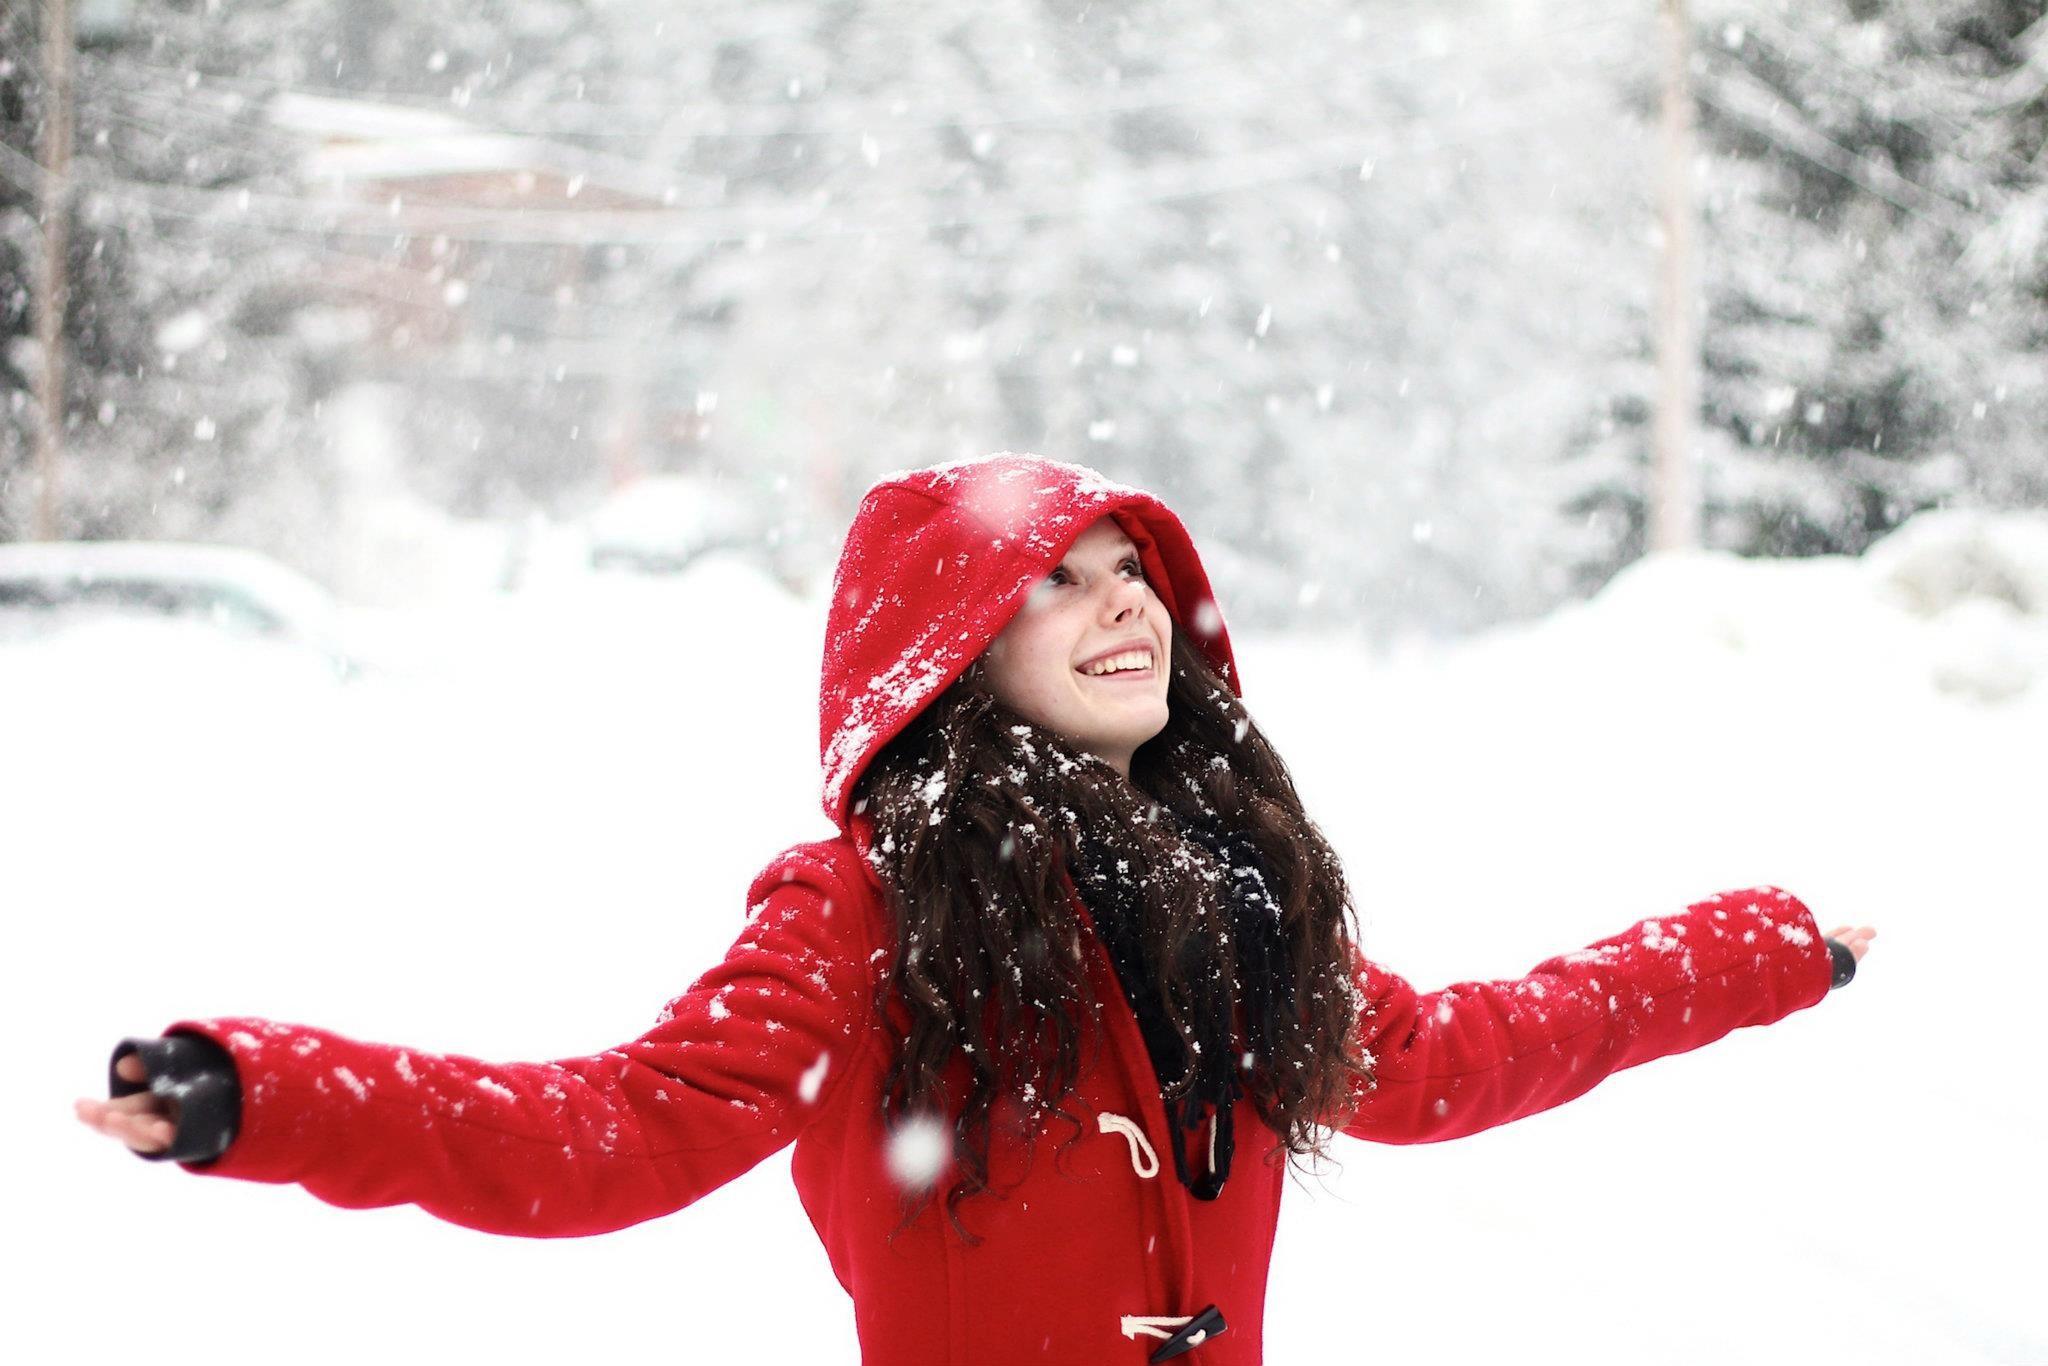 снегопад, снег, зима